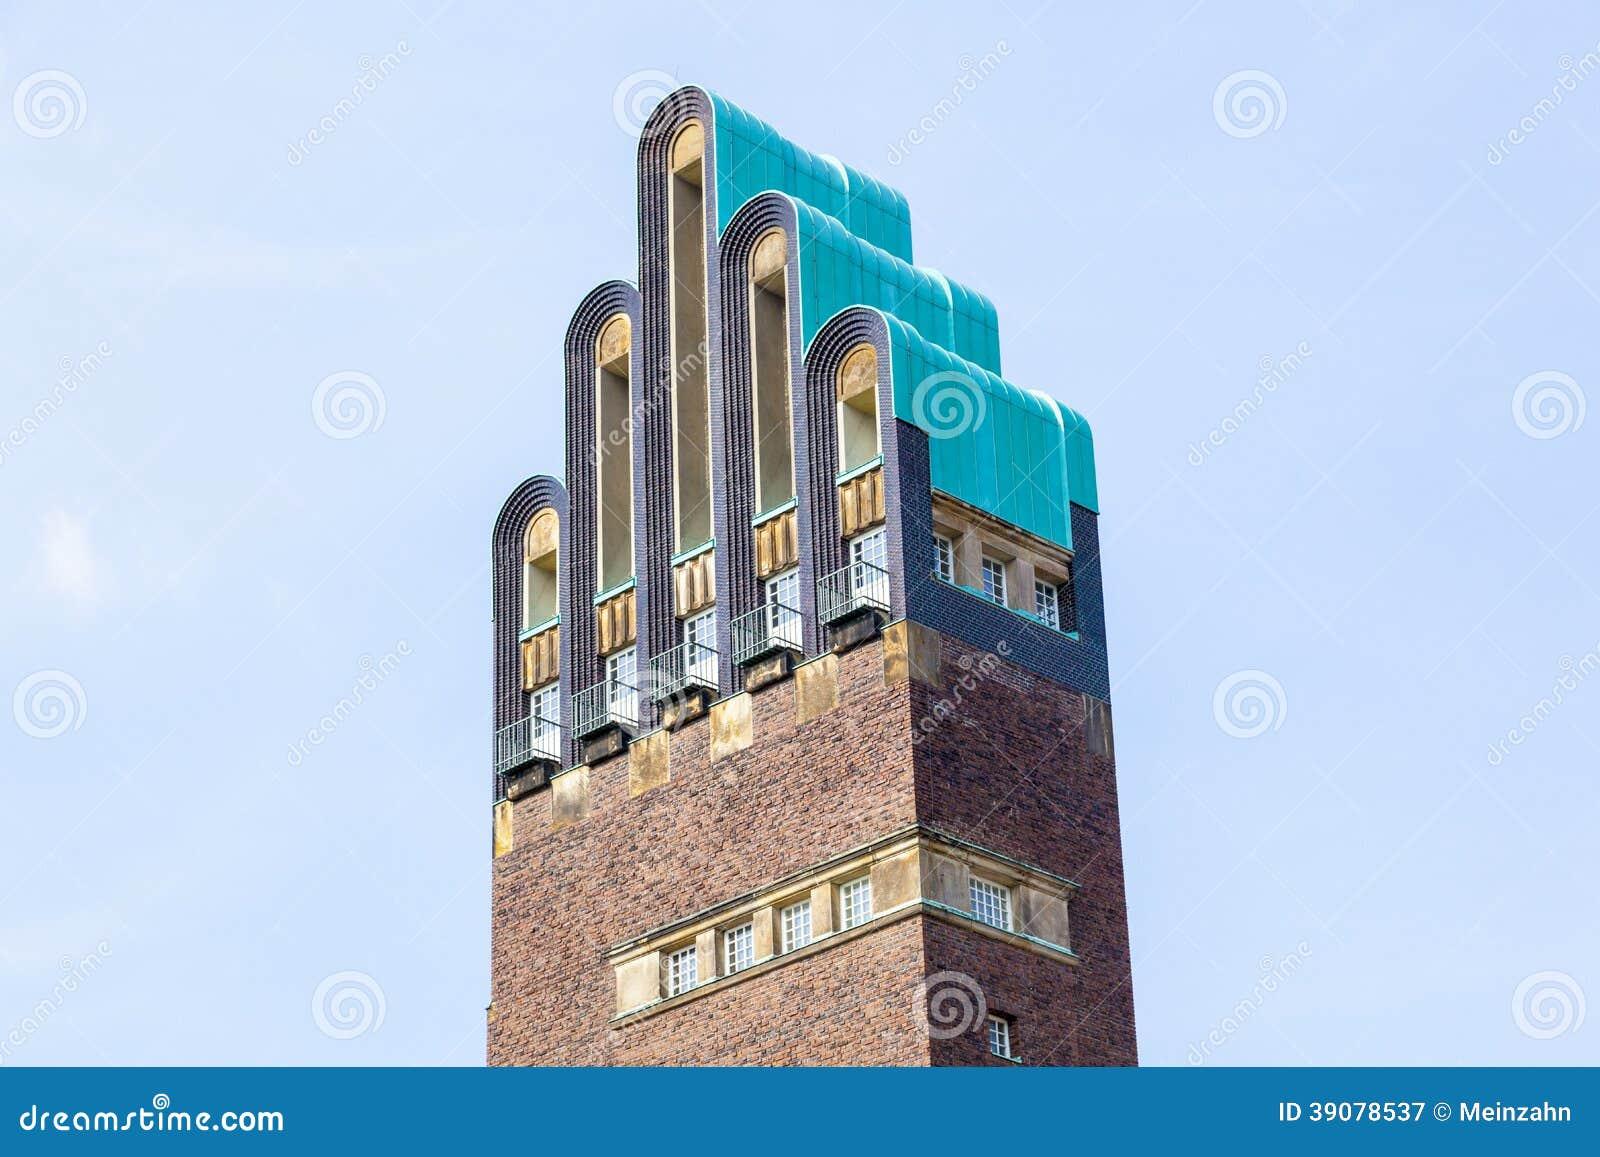 art nouveau style hochzeitsturm wedding tower in. Black Bedroom Furniture Sets. Home Design Ideas